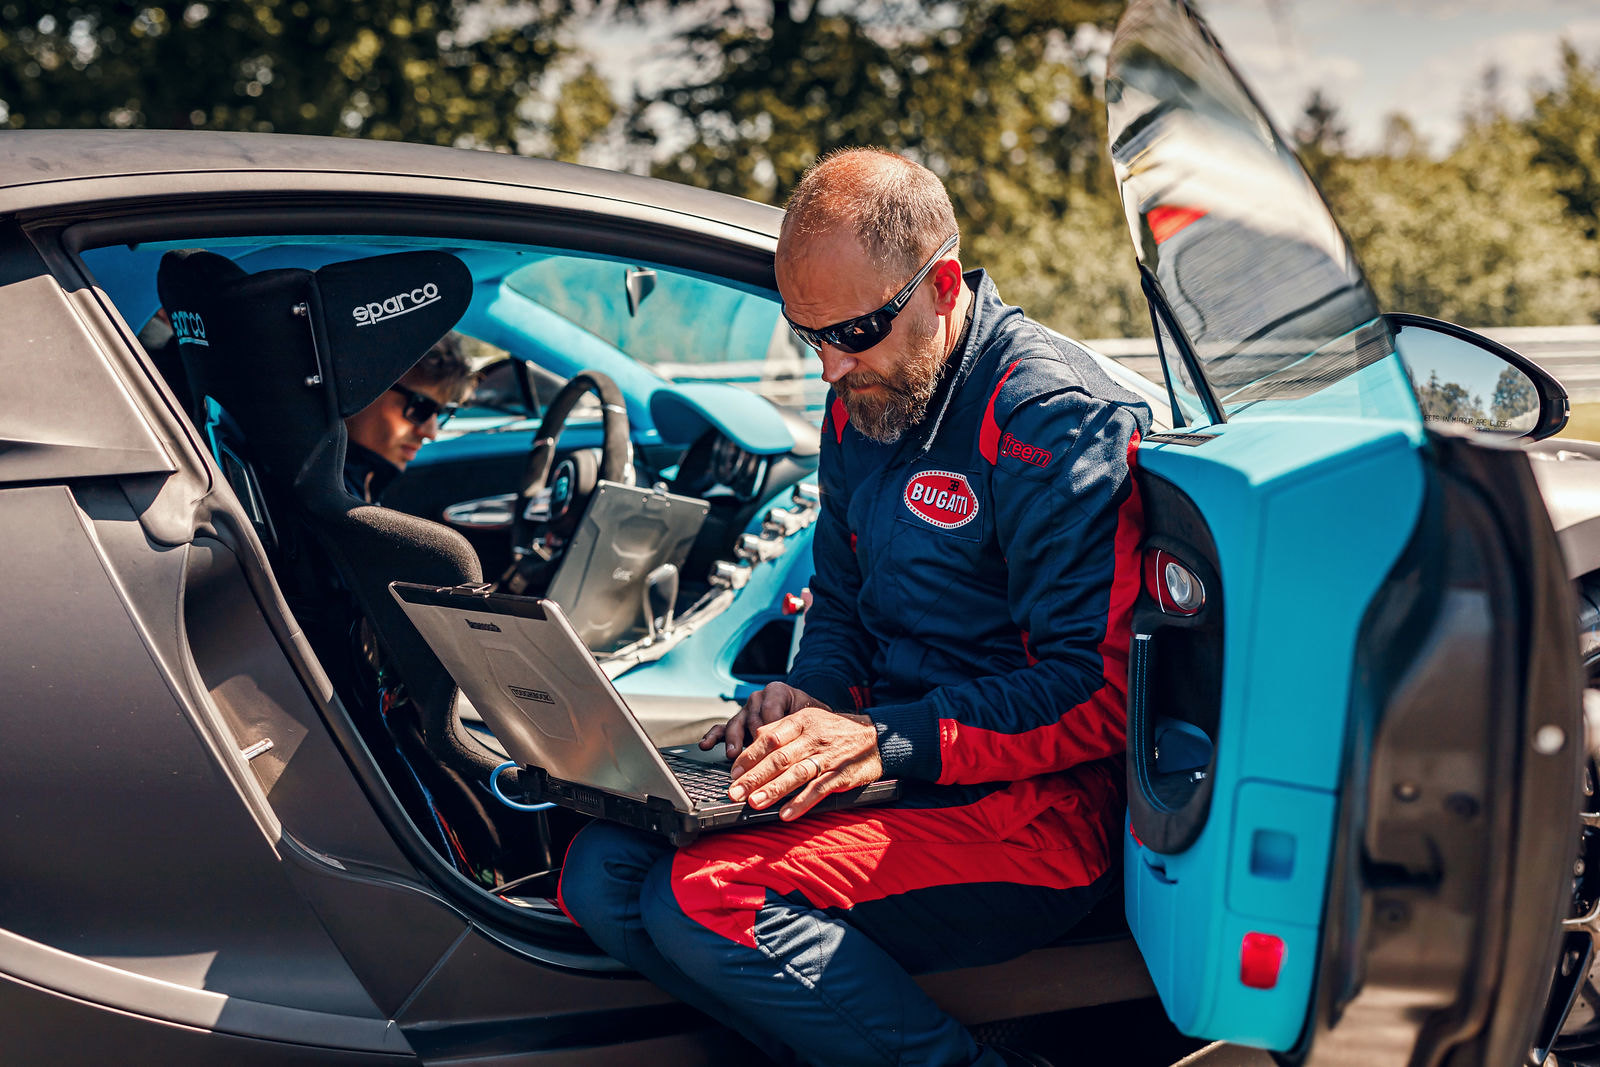 27_chiron-pur-sport_bilster-berg_bts_heilenk-tter-gericke-left-to-right-